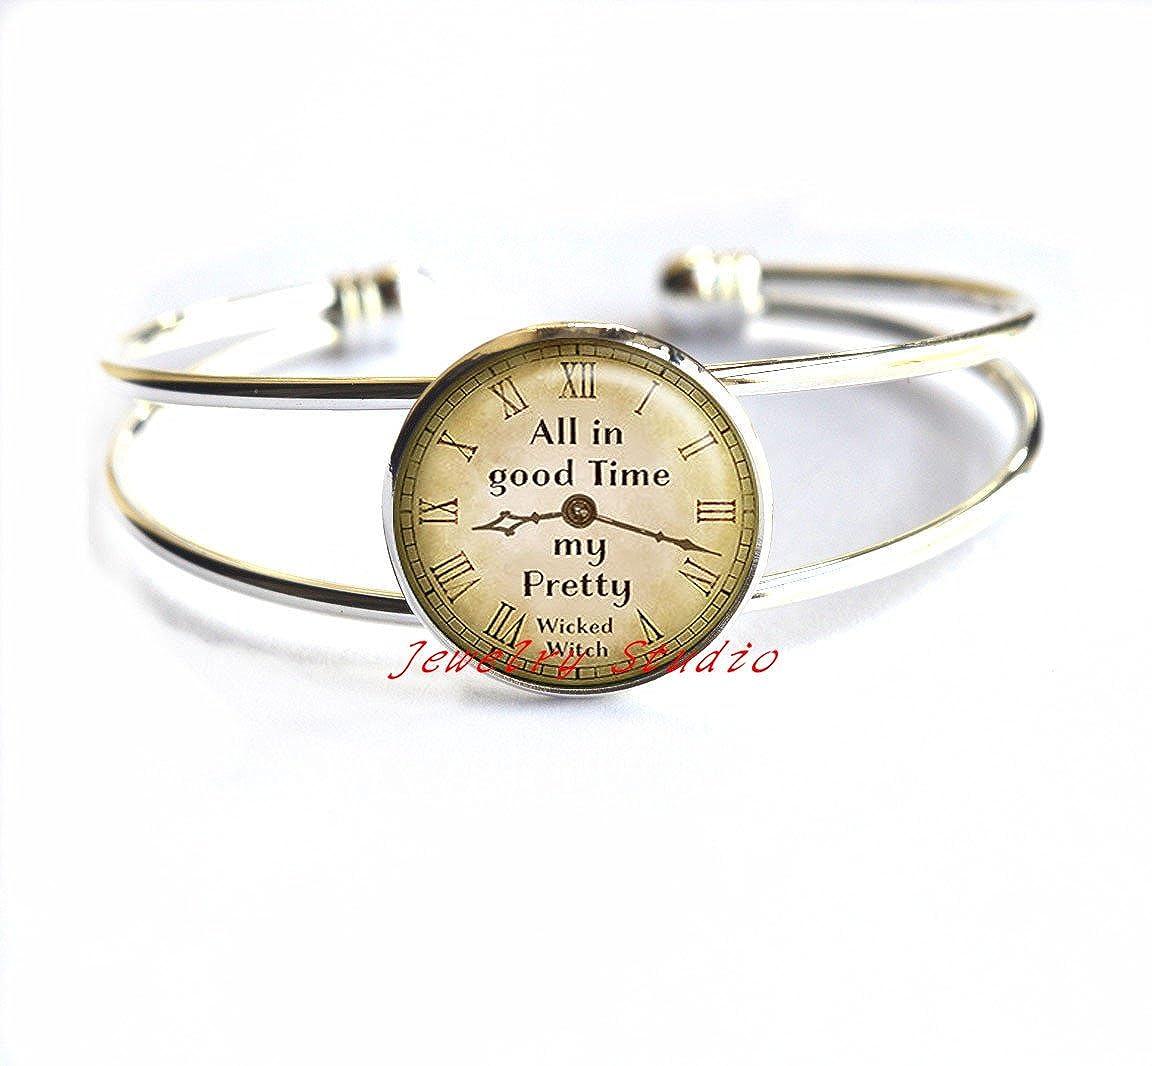 Encouragement Inspirational Bracelet,motivational Bracelet-HZ00373 All in Good Time My Pretty Bracelet